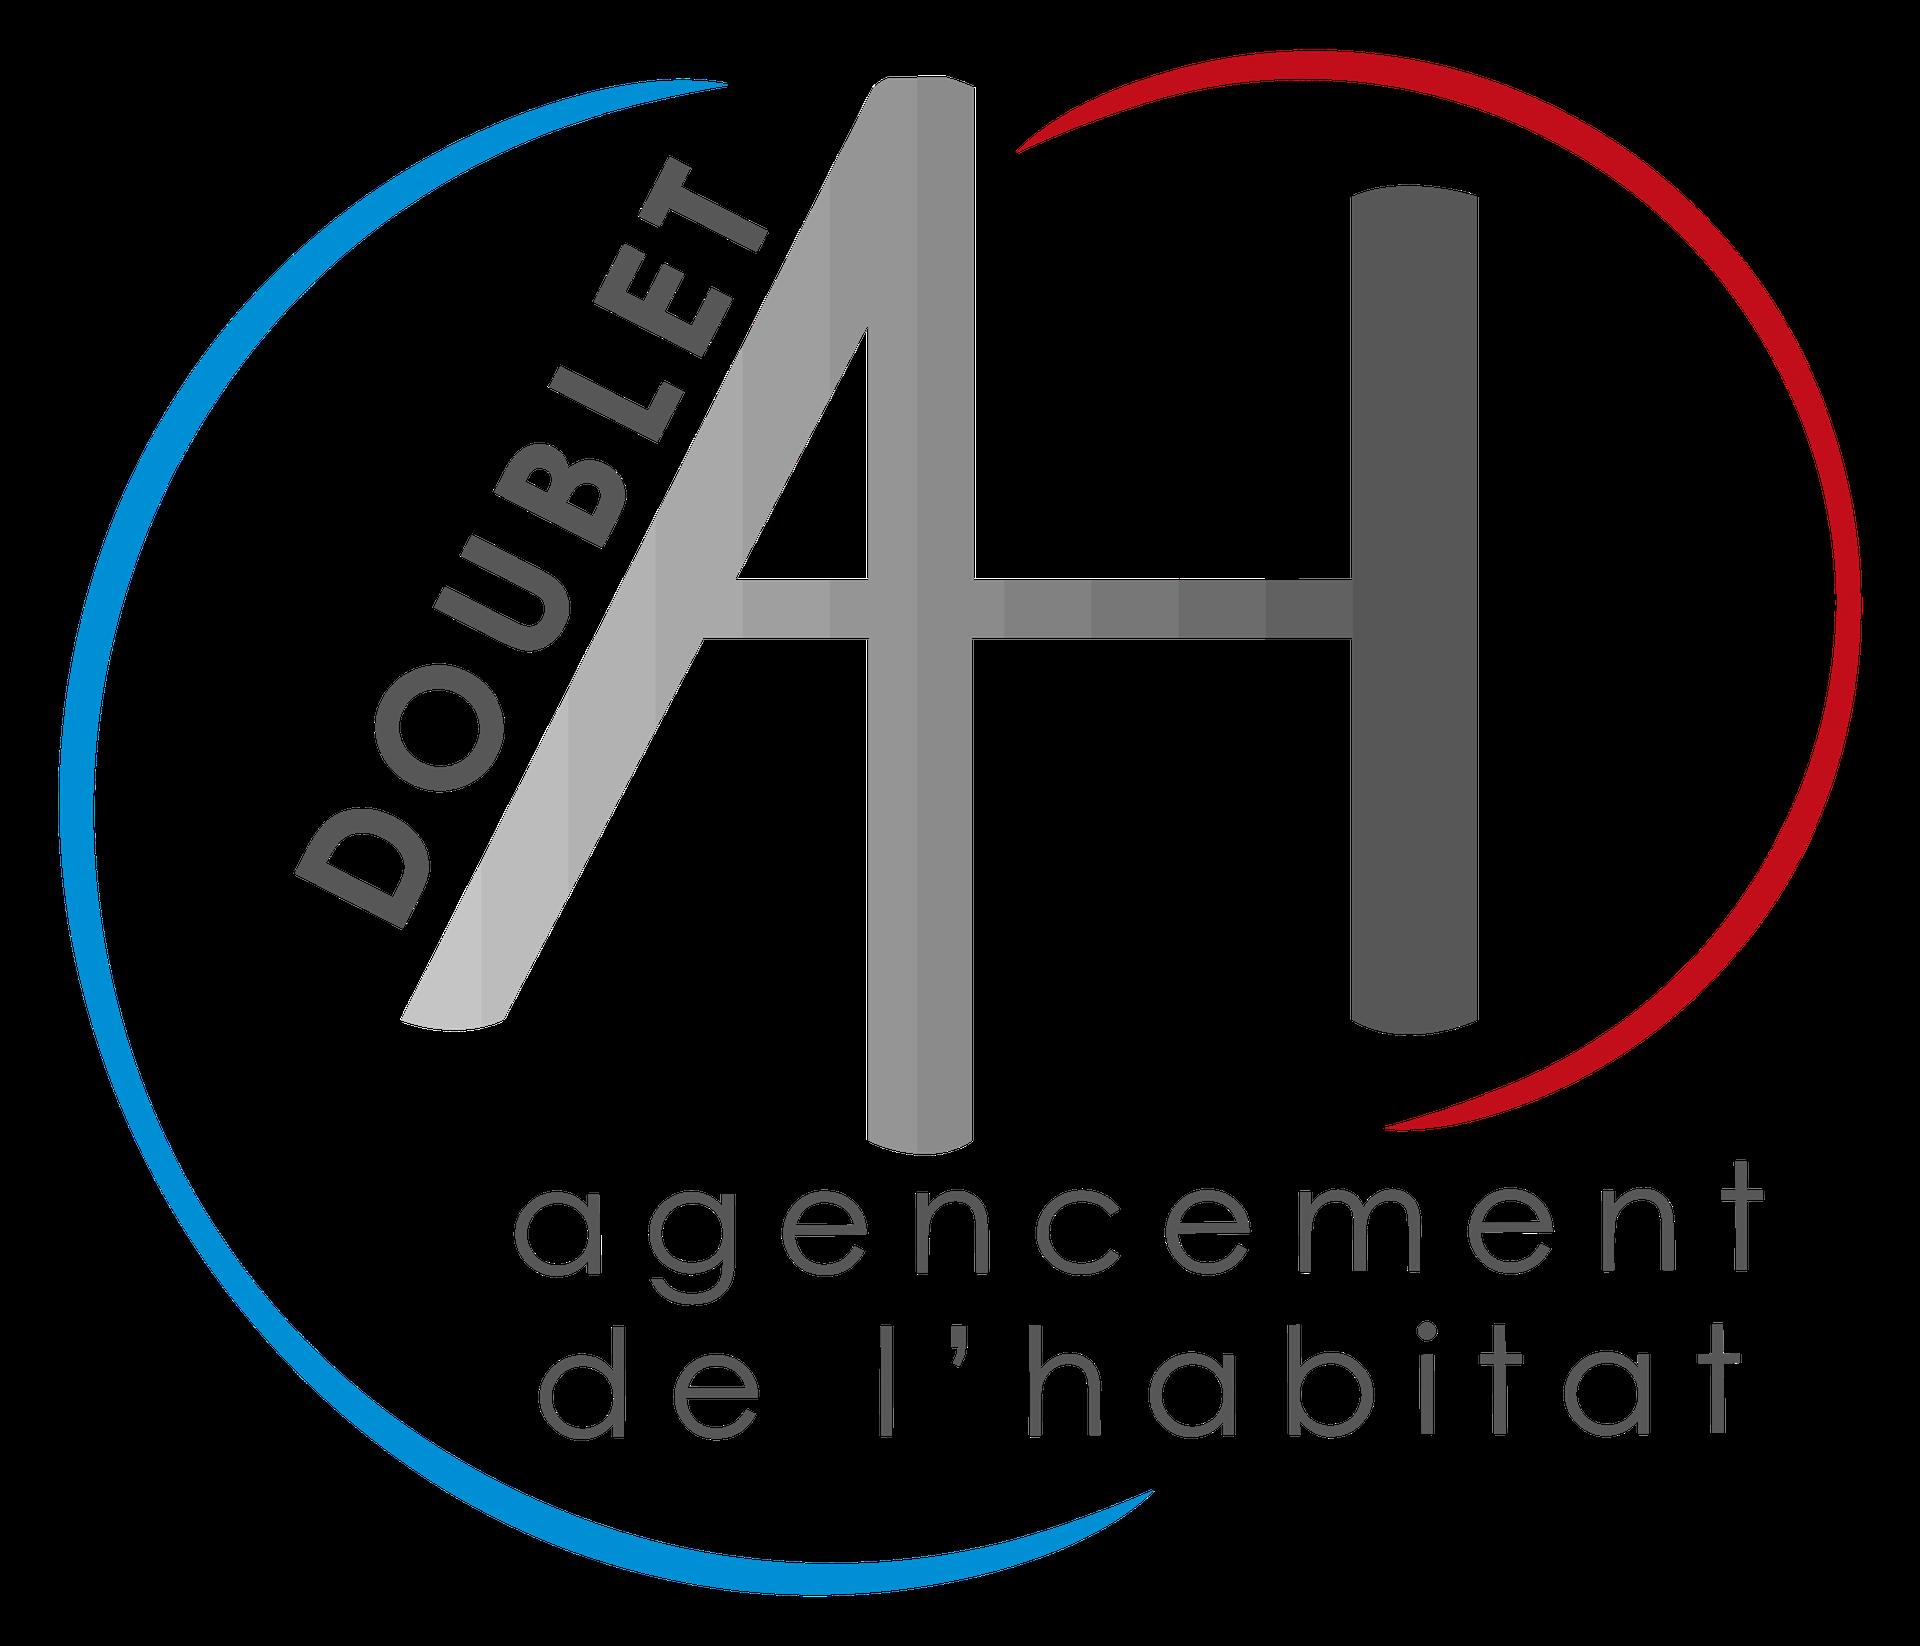 Breton - Doublet (ETS) cuisiniste